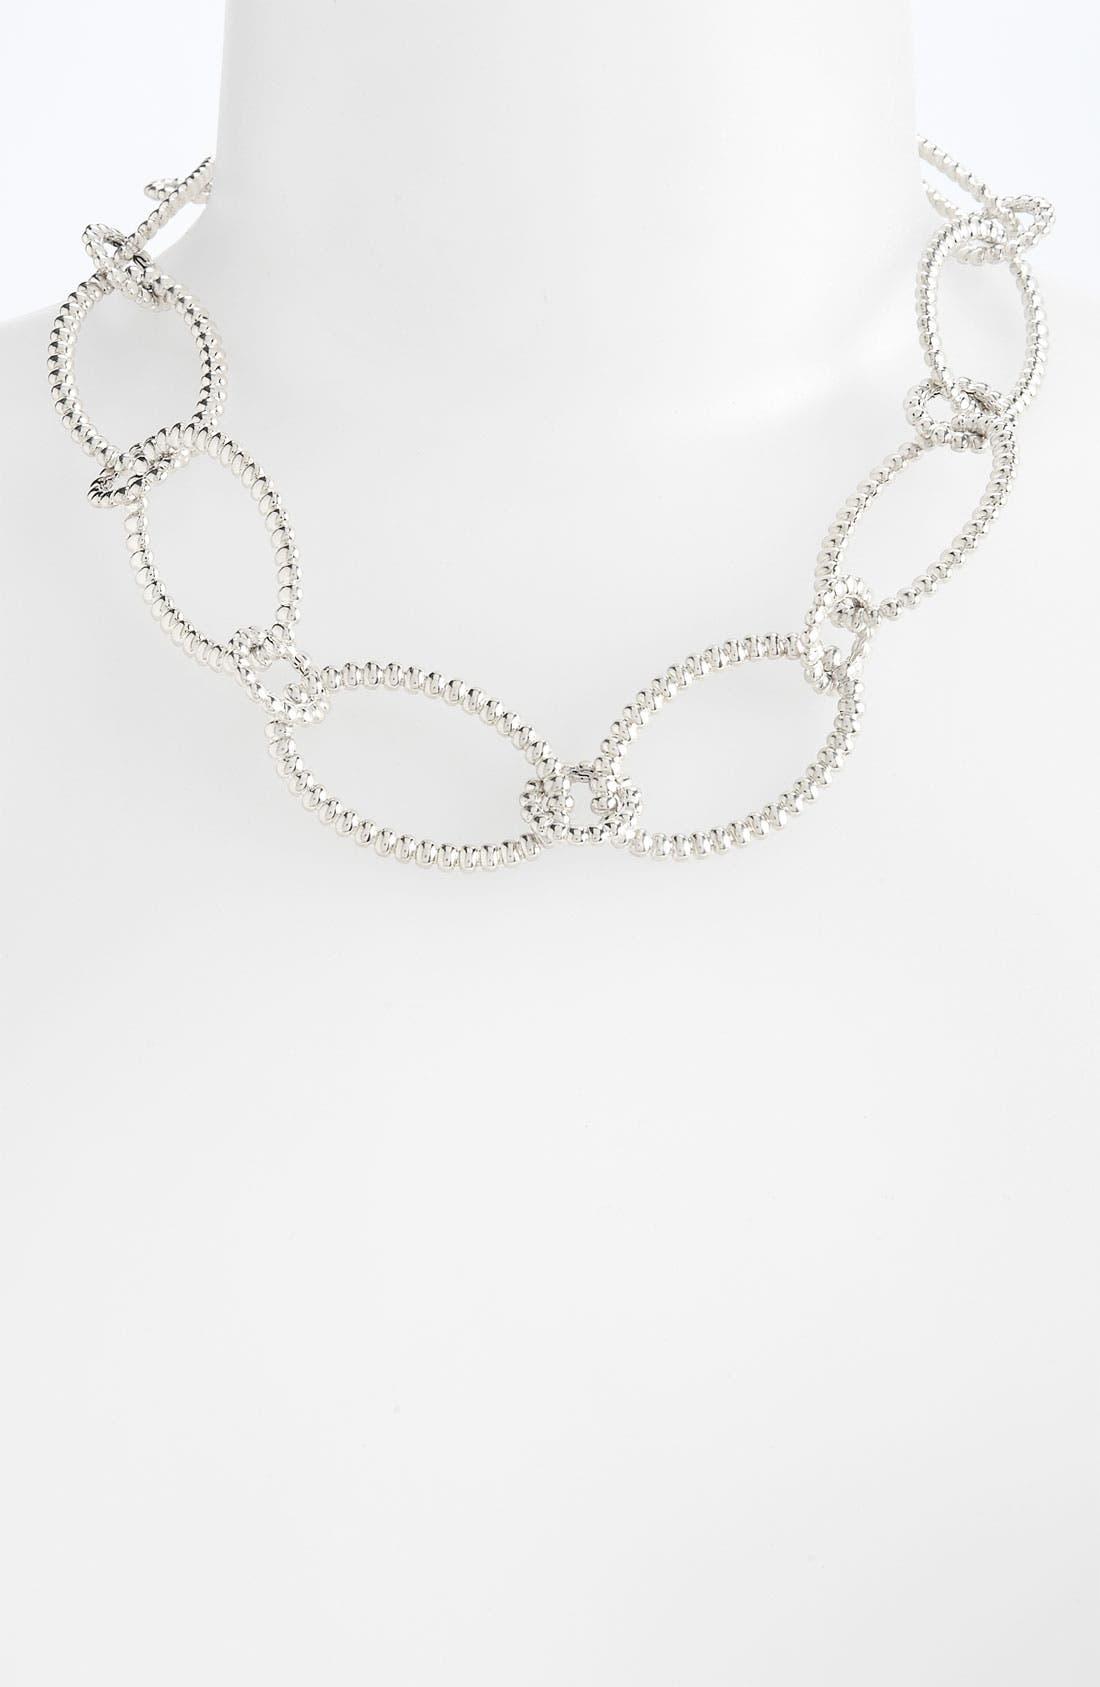 Alternate Image 1 Selected - John Hardy 'Bedeg' Silver Link Necklace